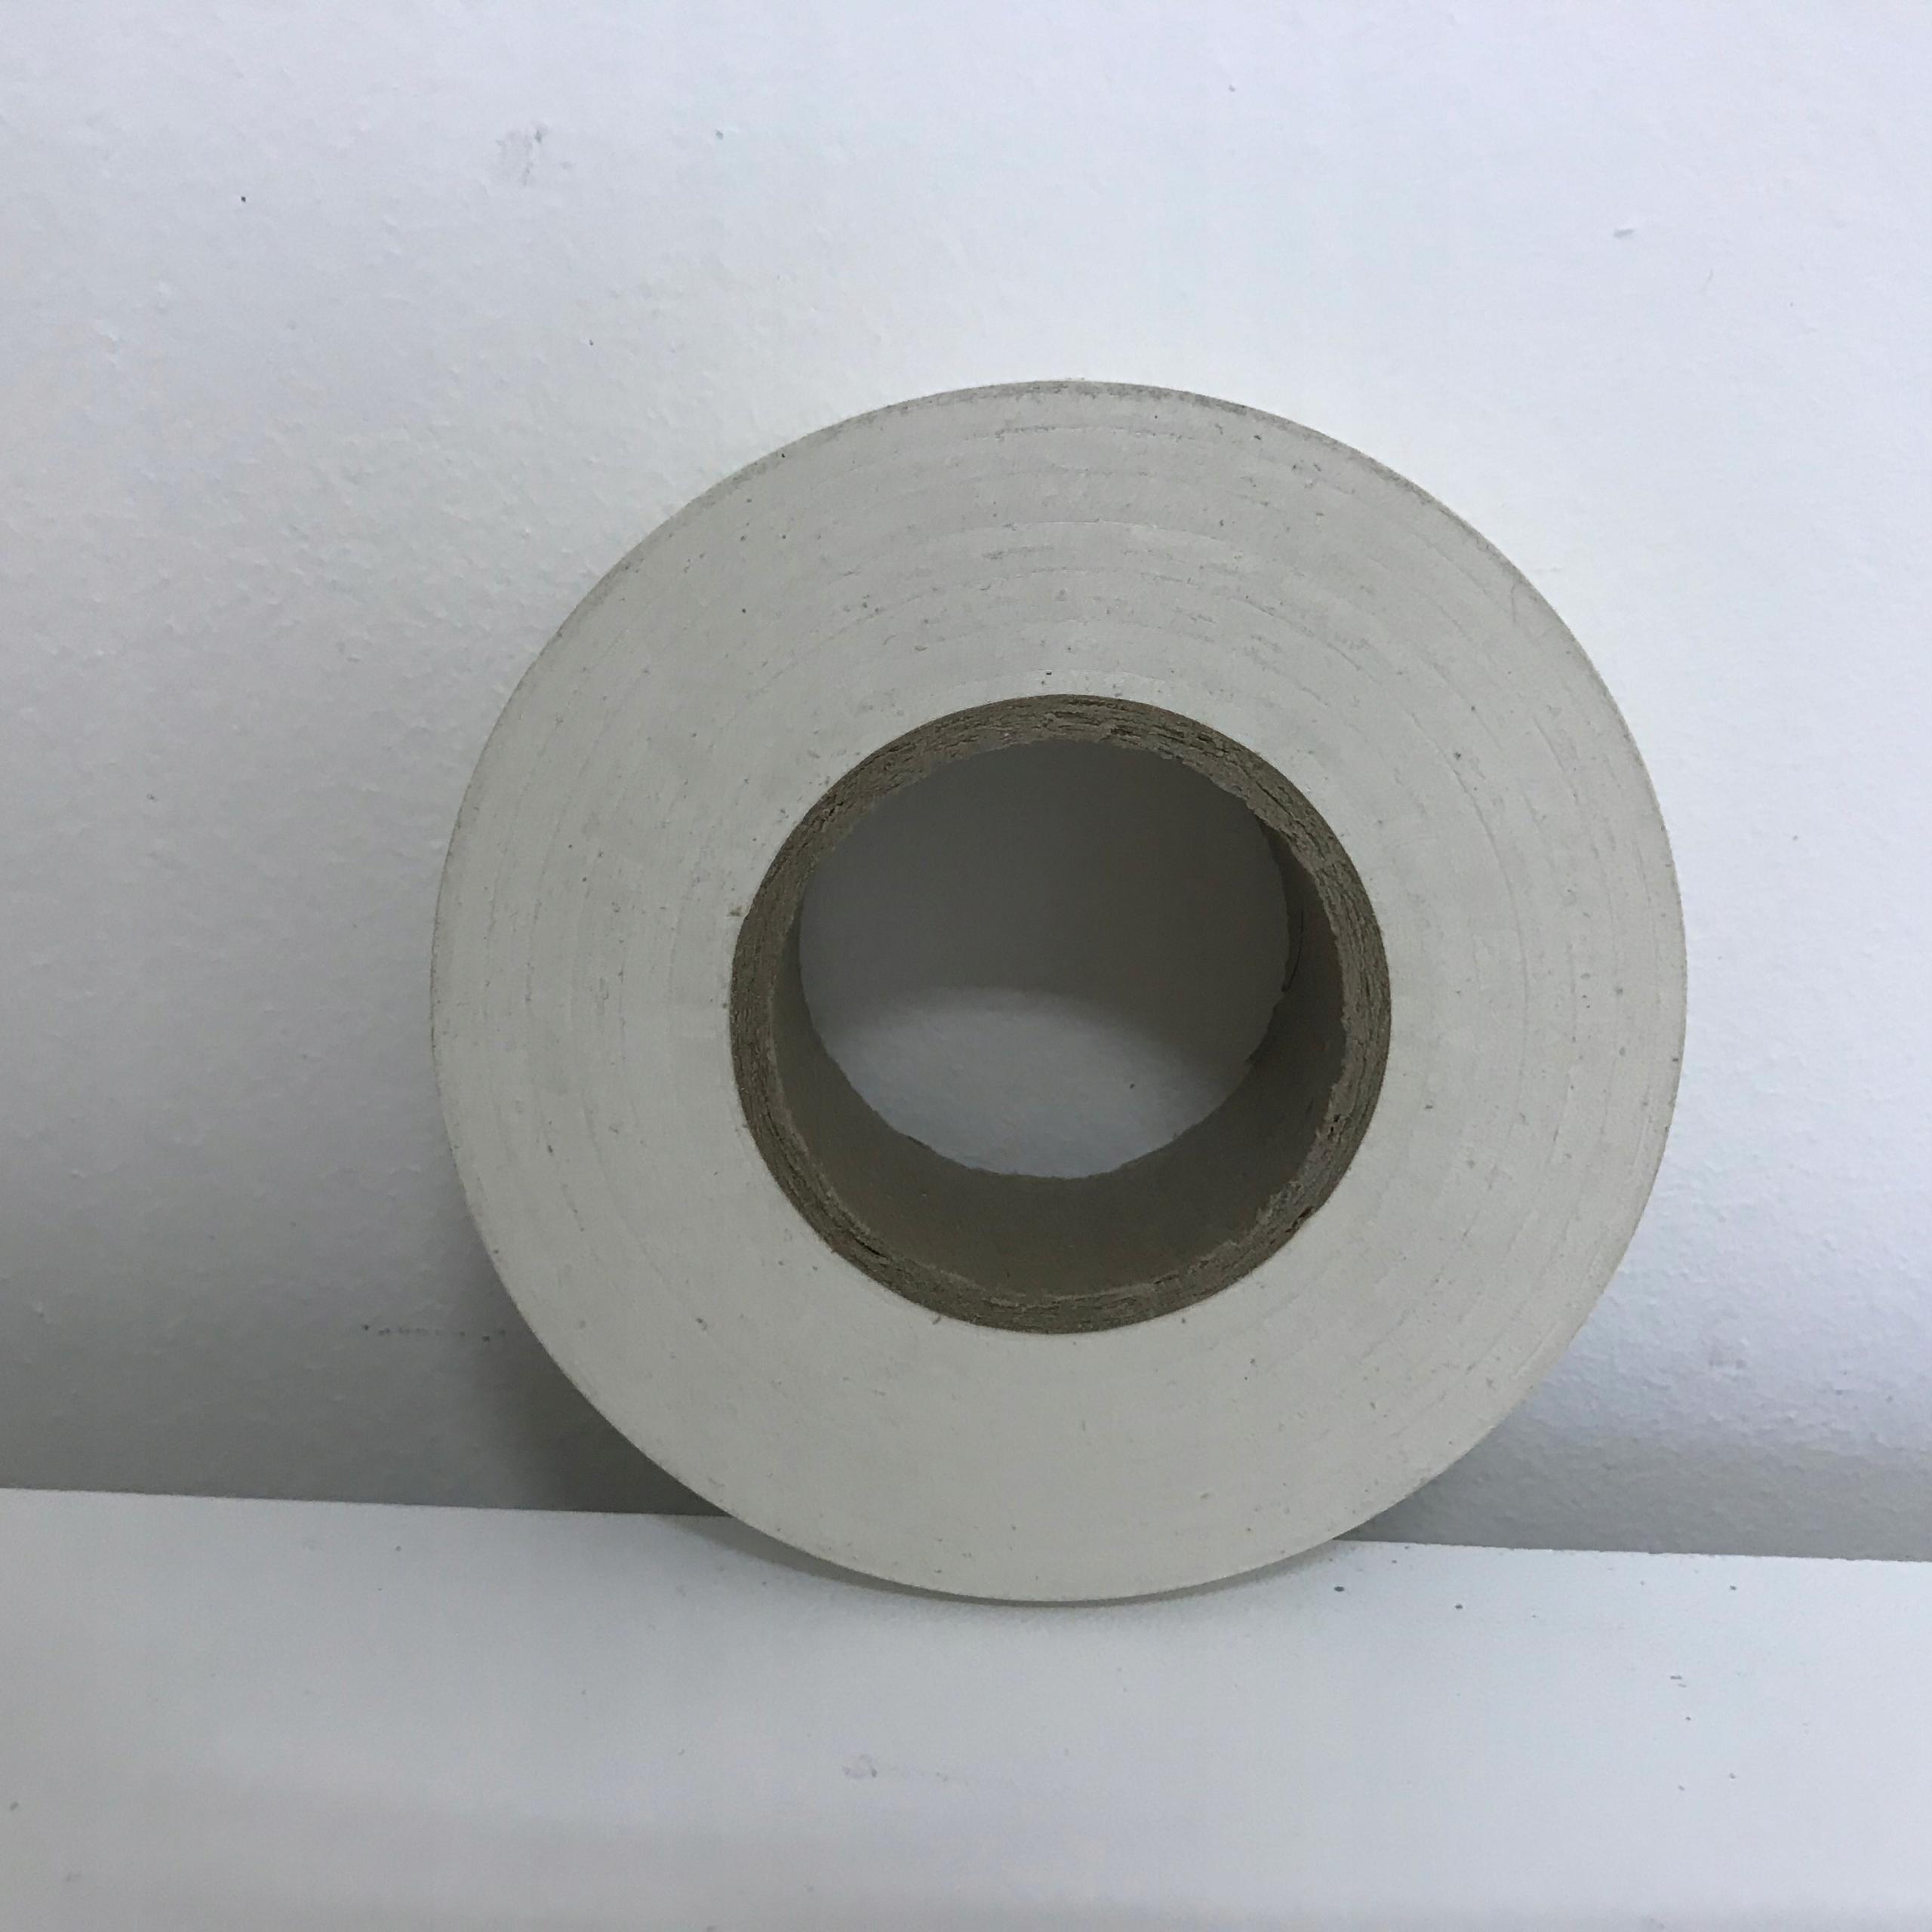 лента изоляционная 25/33 м Плимут, белый